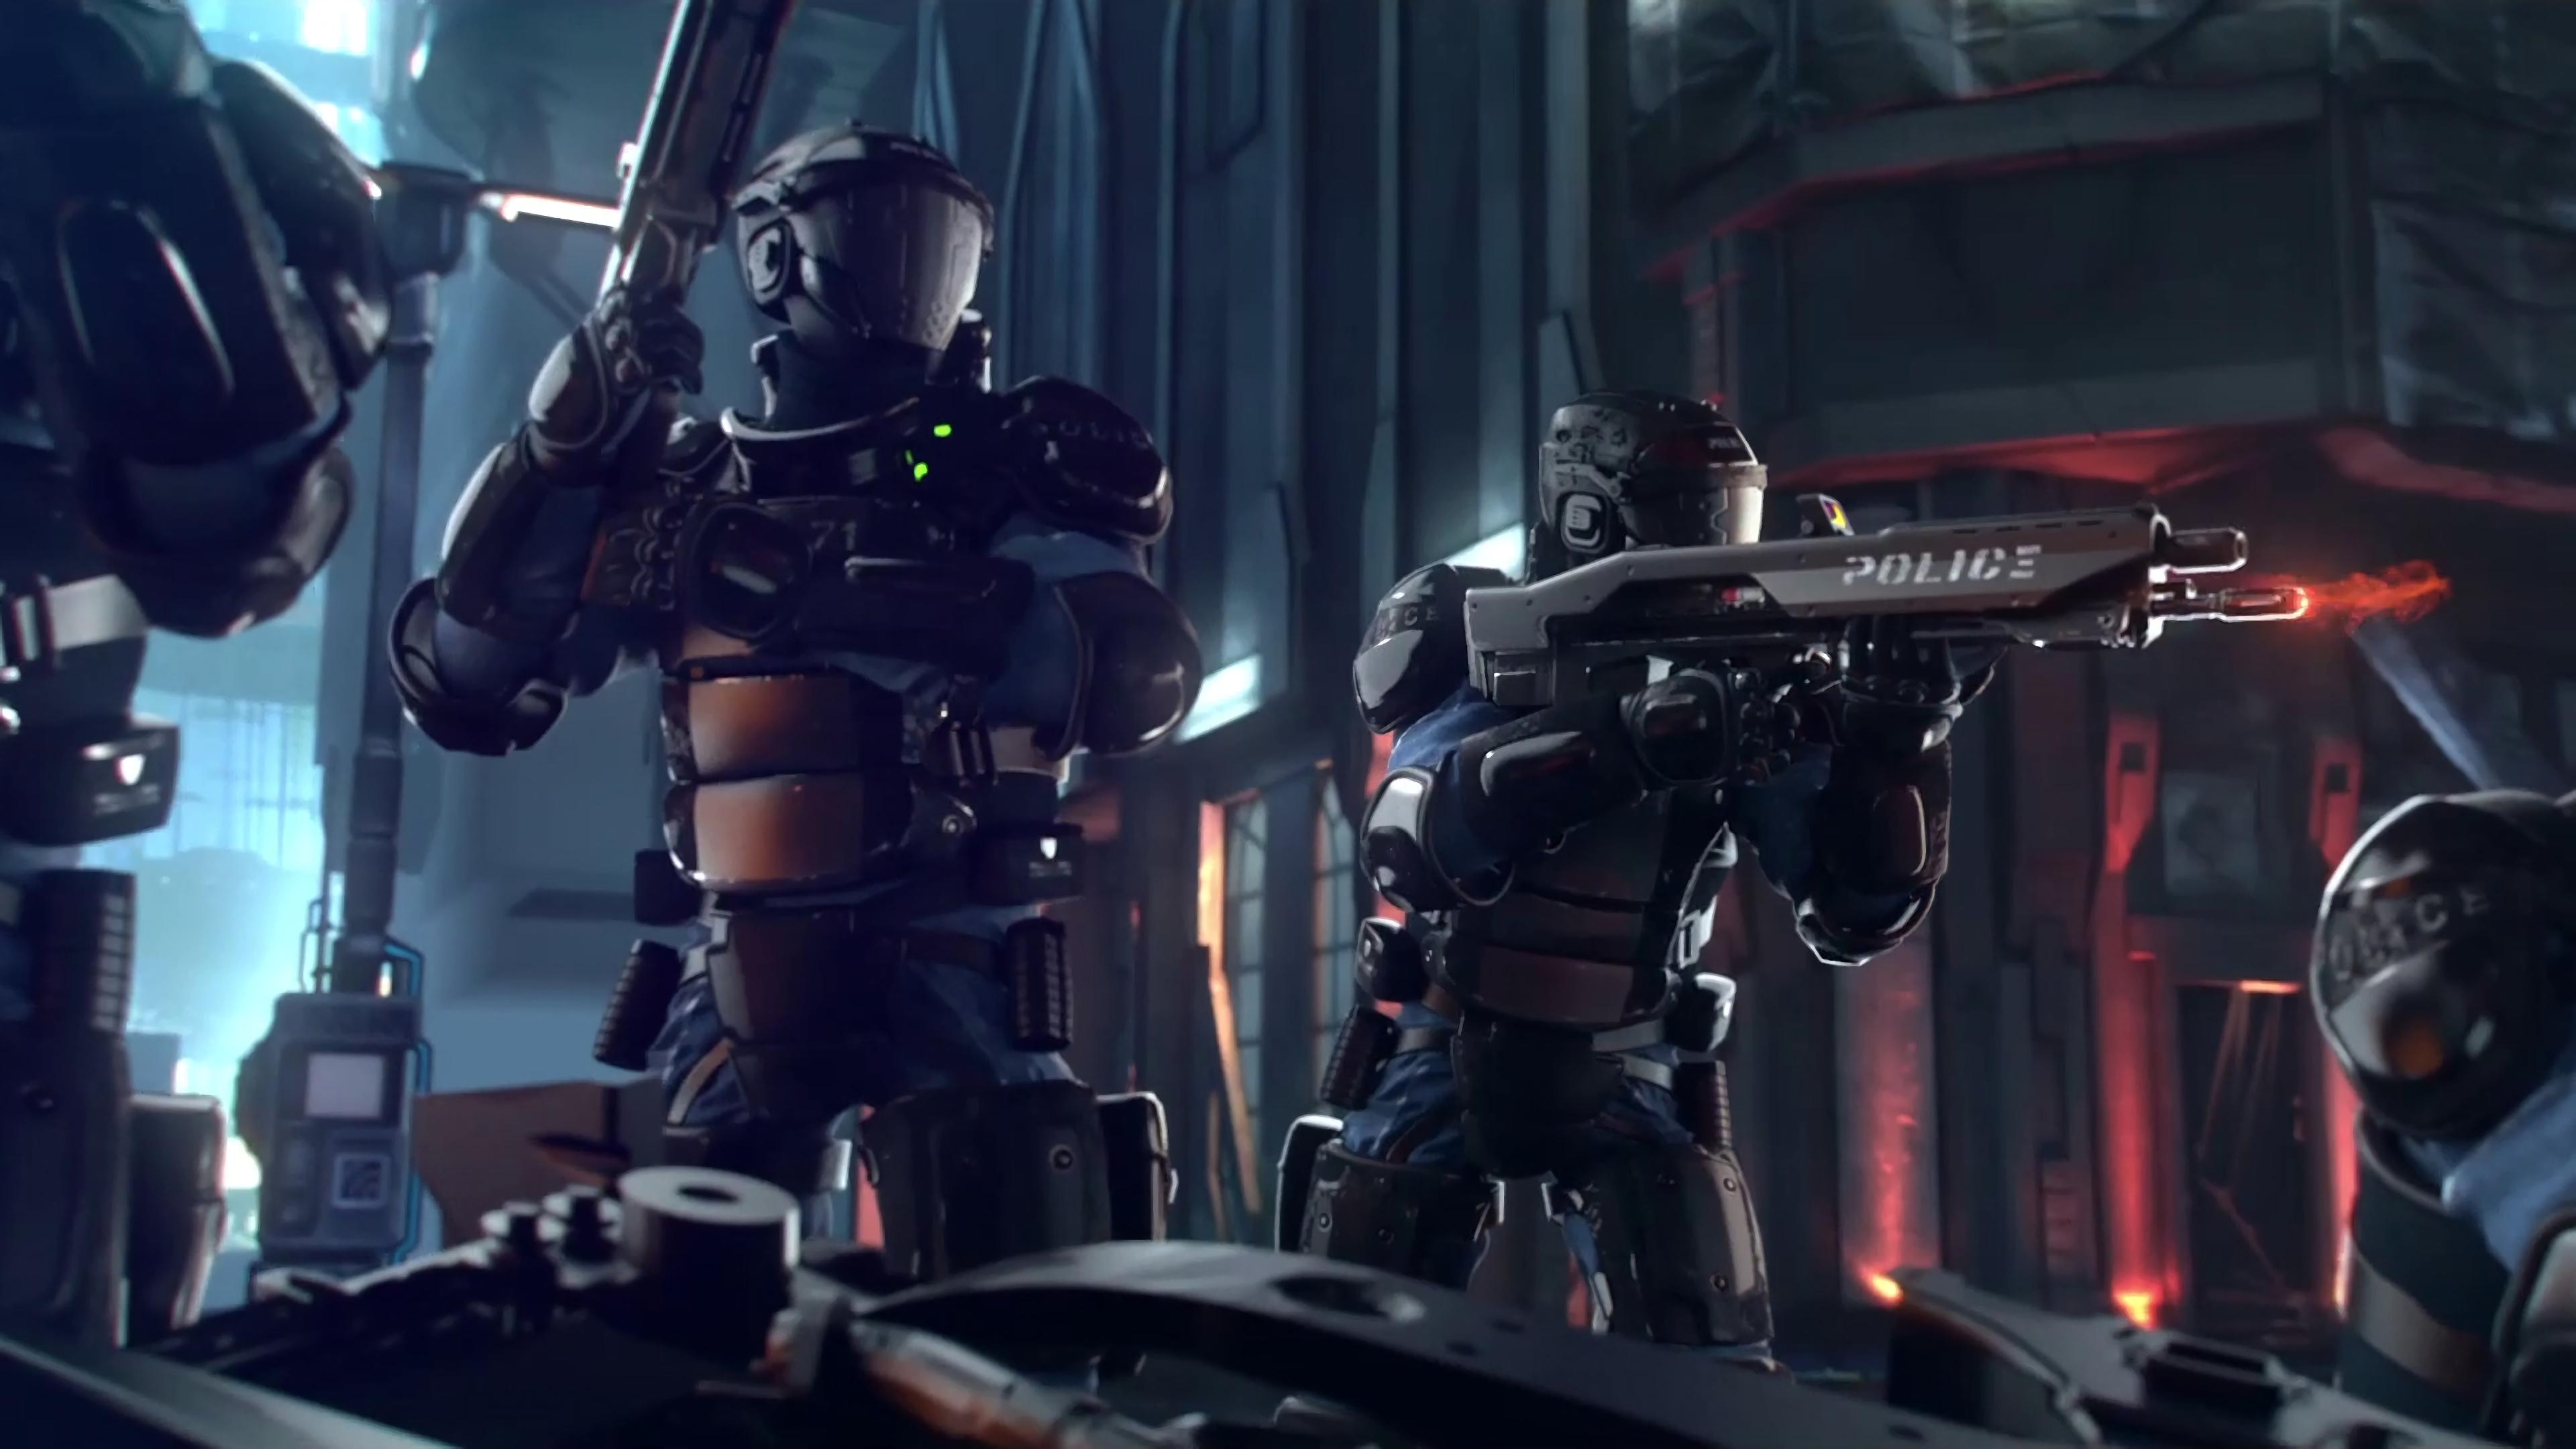 Cyberpunk 2077 Dual Monitor Wallpaper